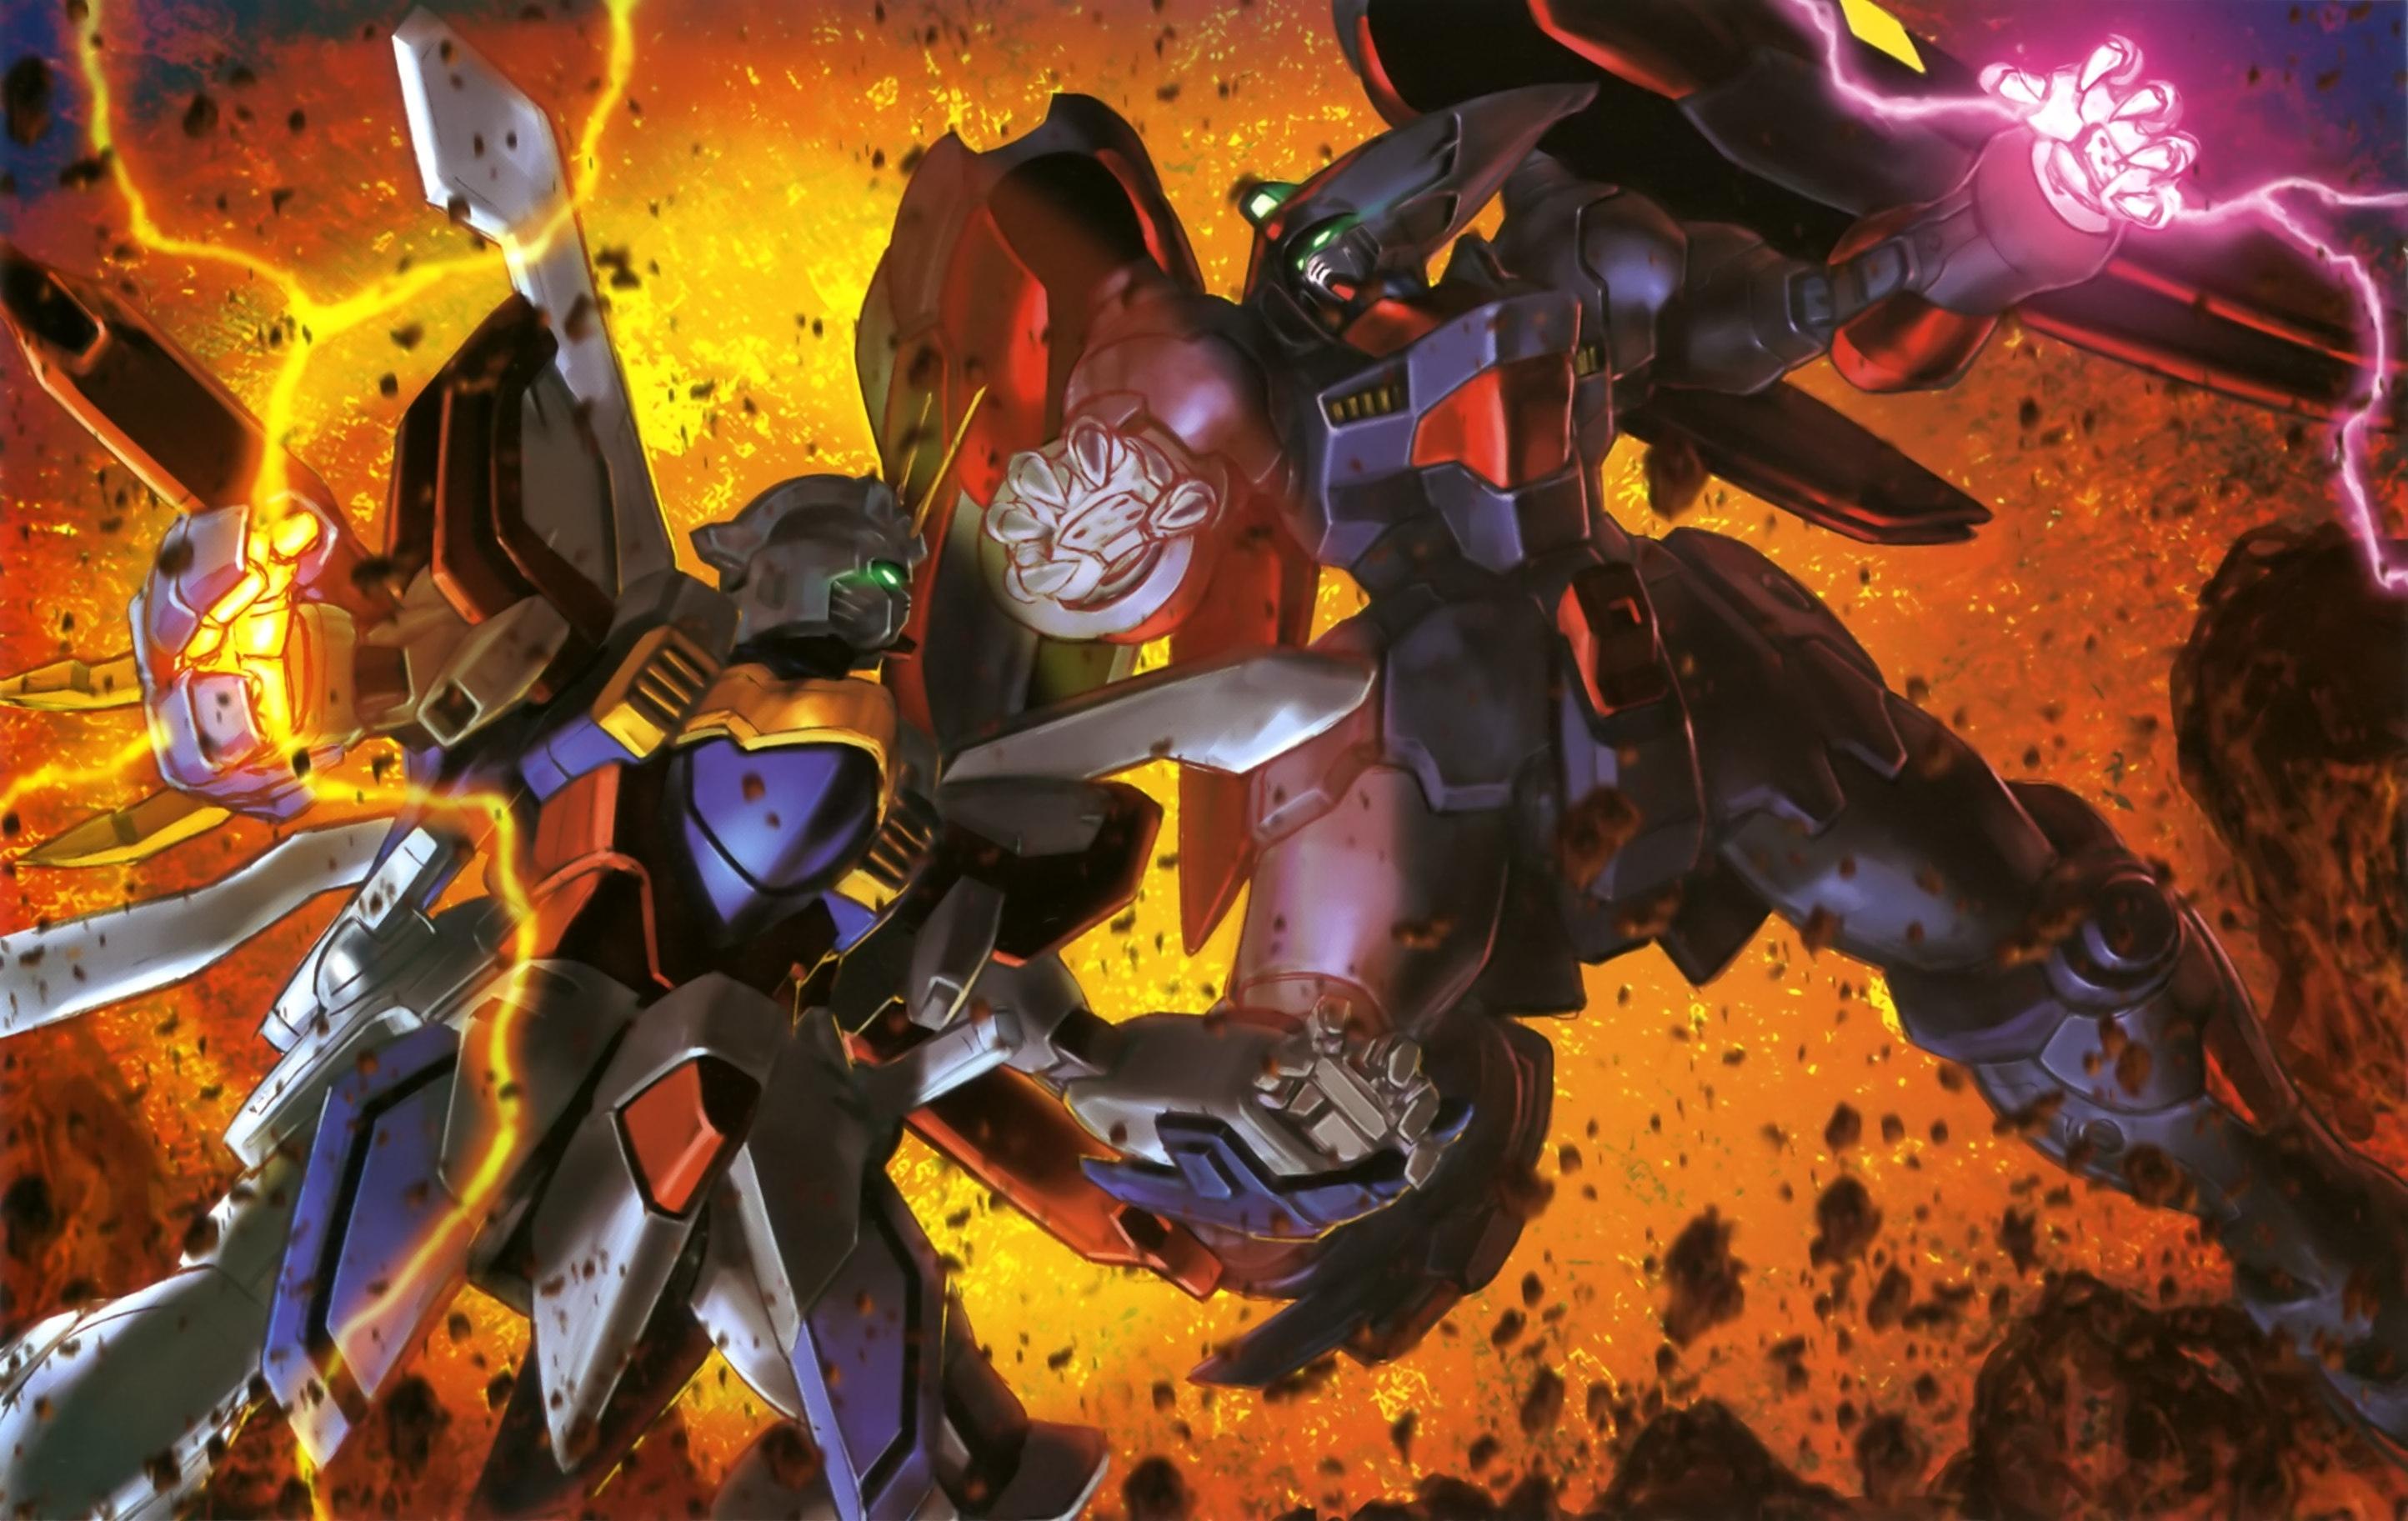 G Gundam Wallpapers G gundam  G Gundam Wallpapers